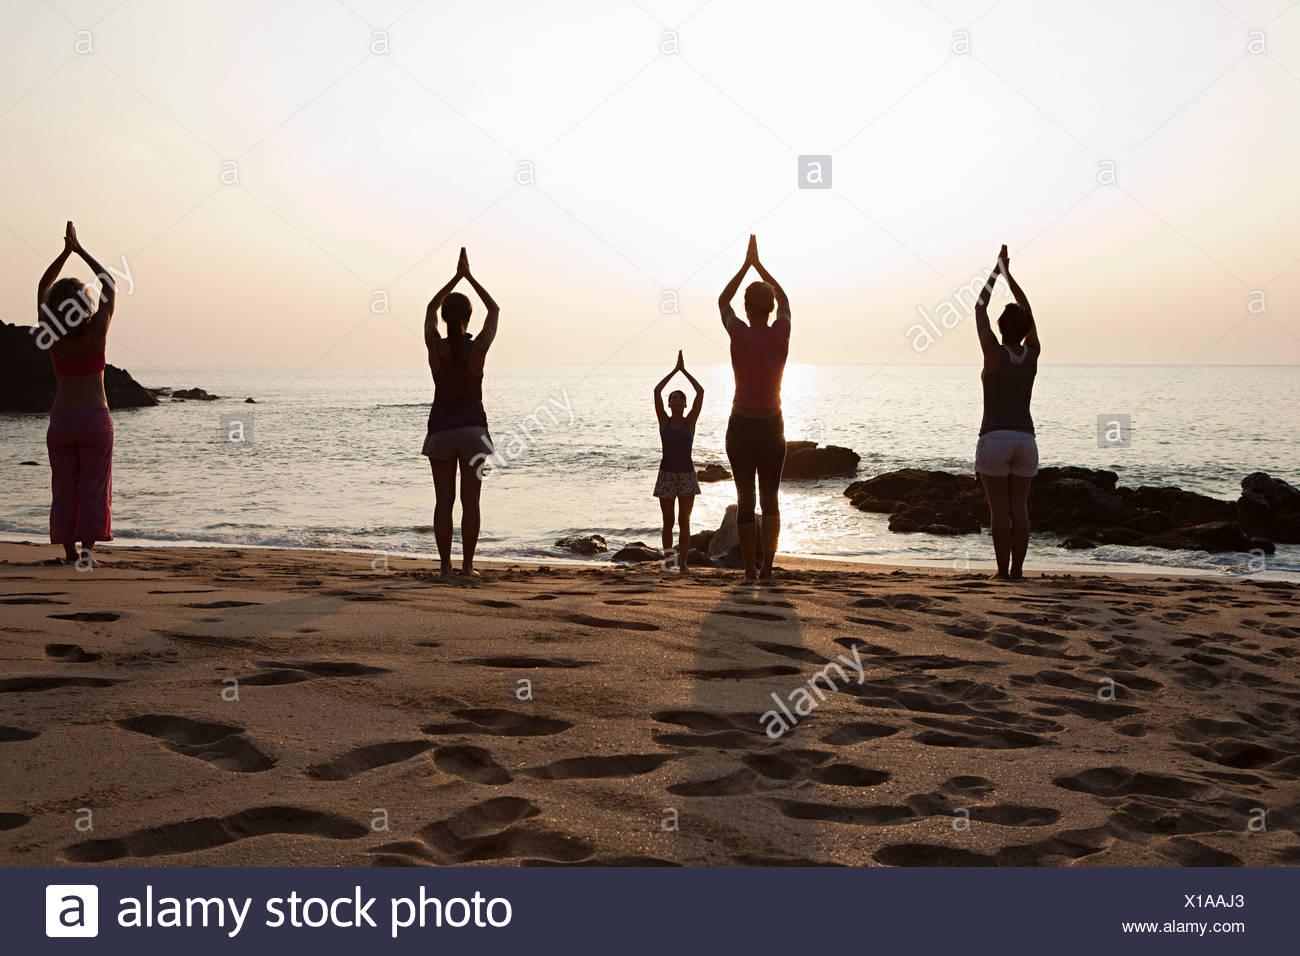 Women practicing yoga on beach at sunset - Stock Image